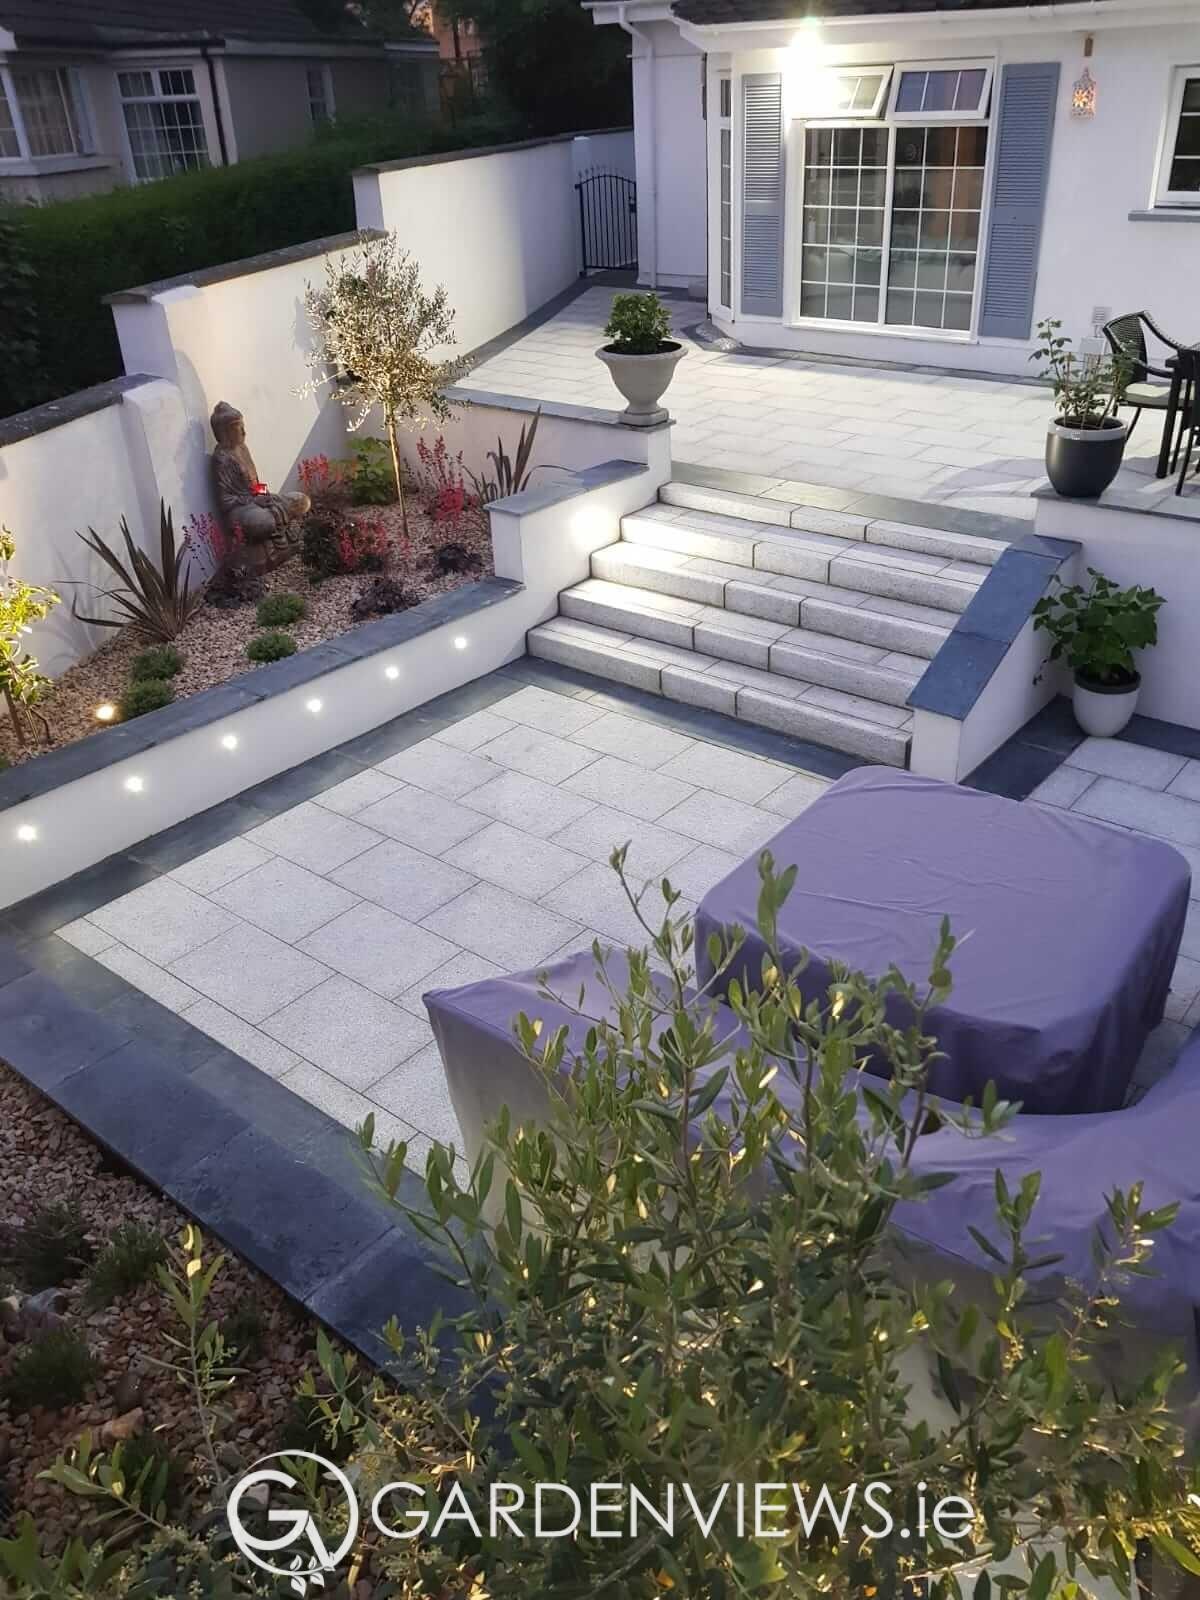 About Gardenviews - Garden Designers Dublin, Leading ...